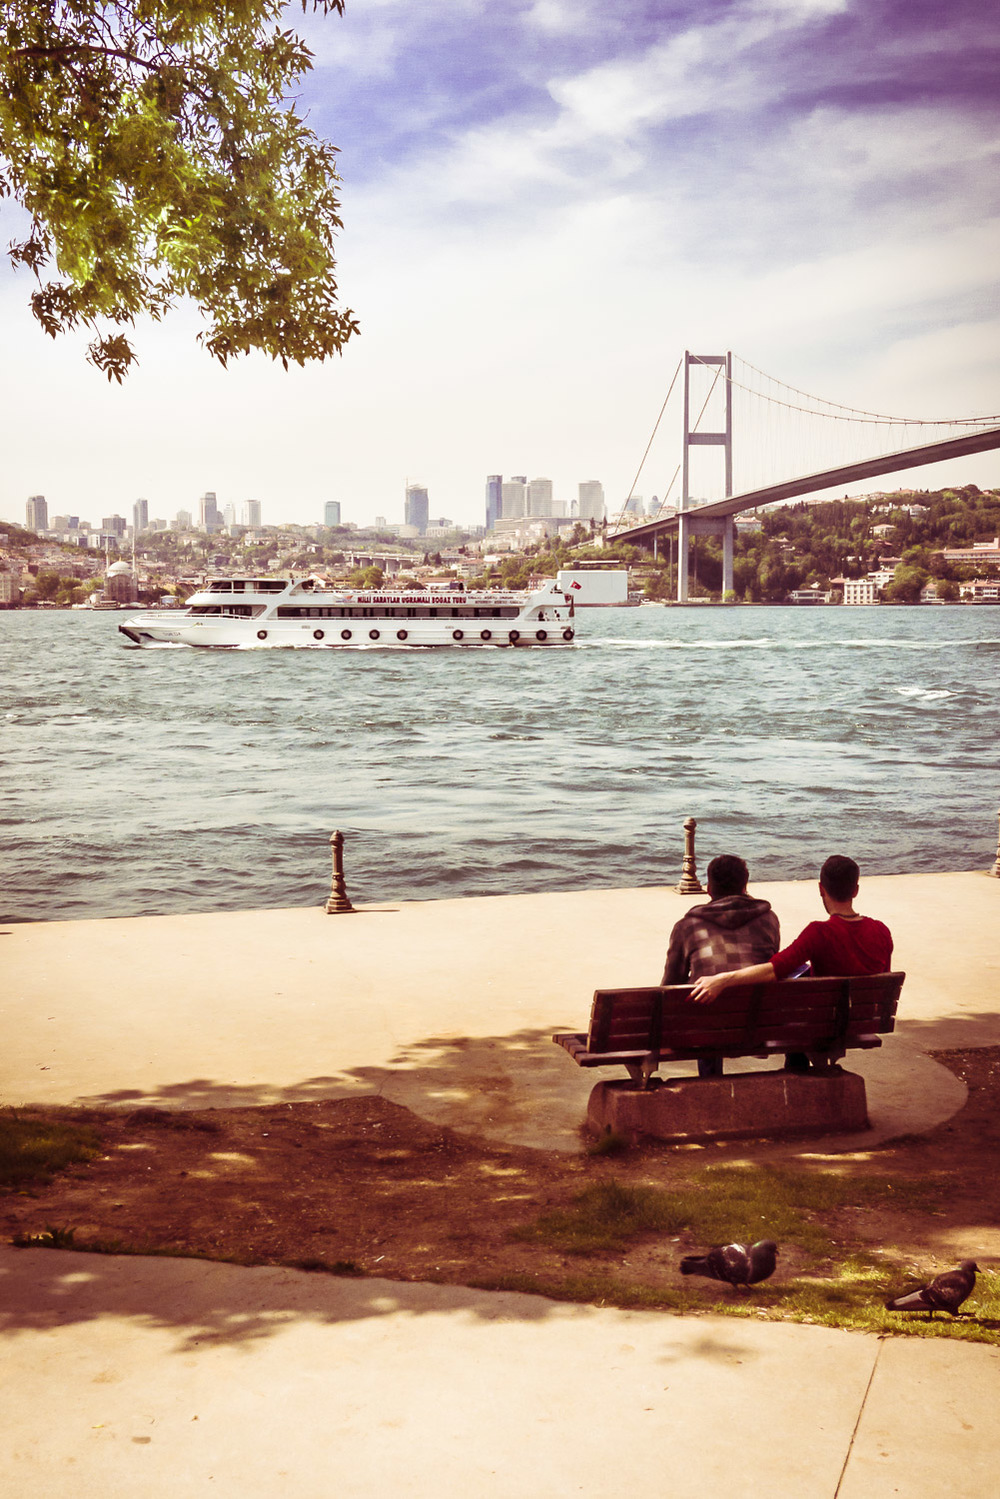 04-universitas-istanbul-(c)-nicolas-brodard-ref120514151426.jpg